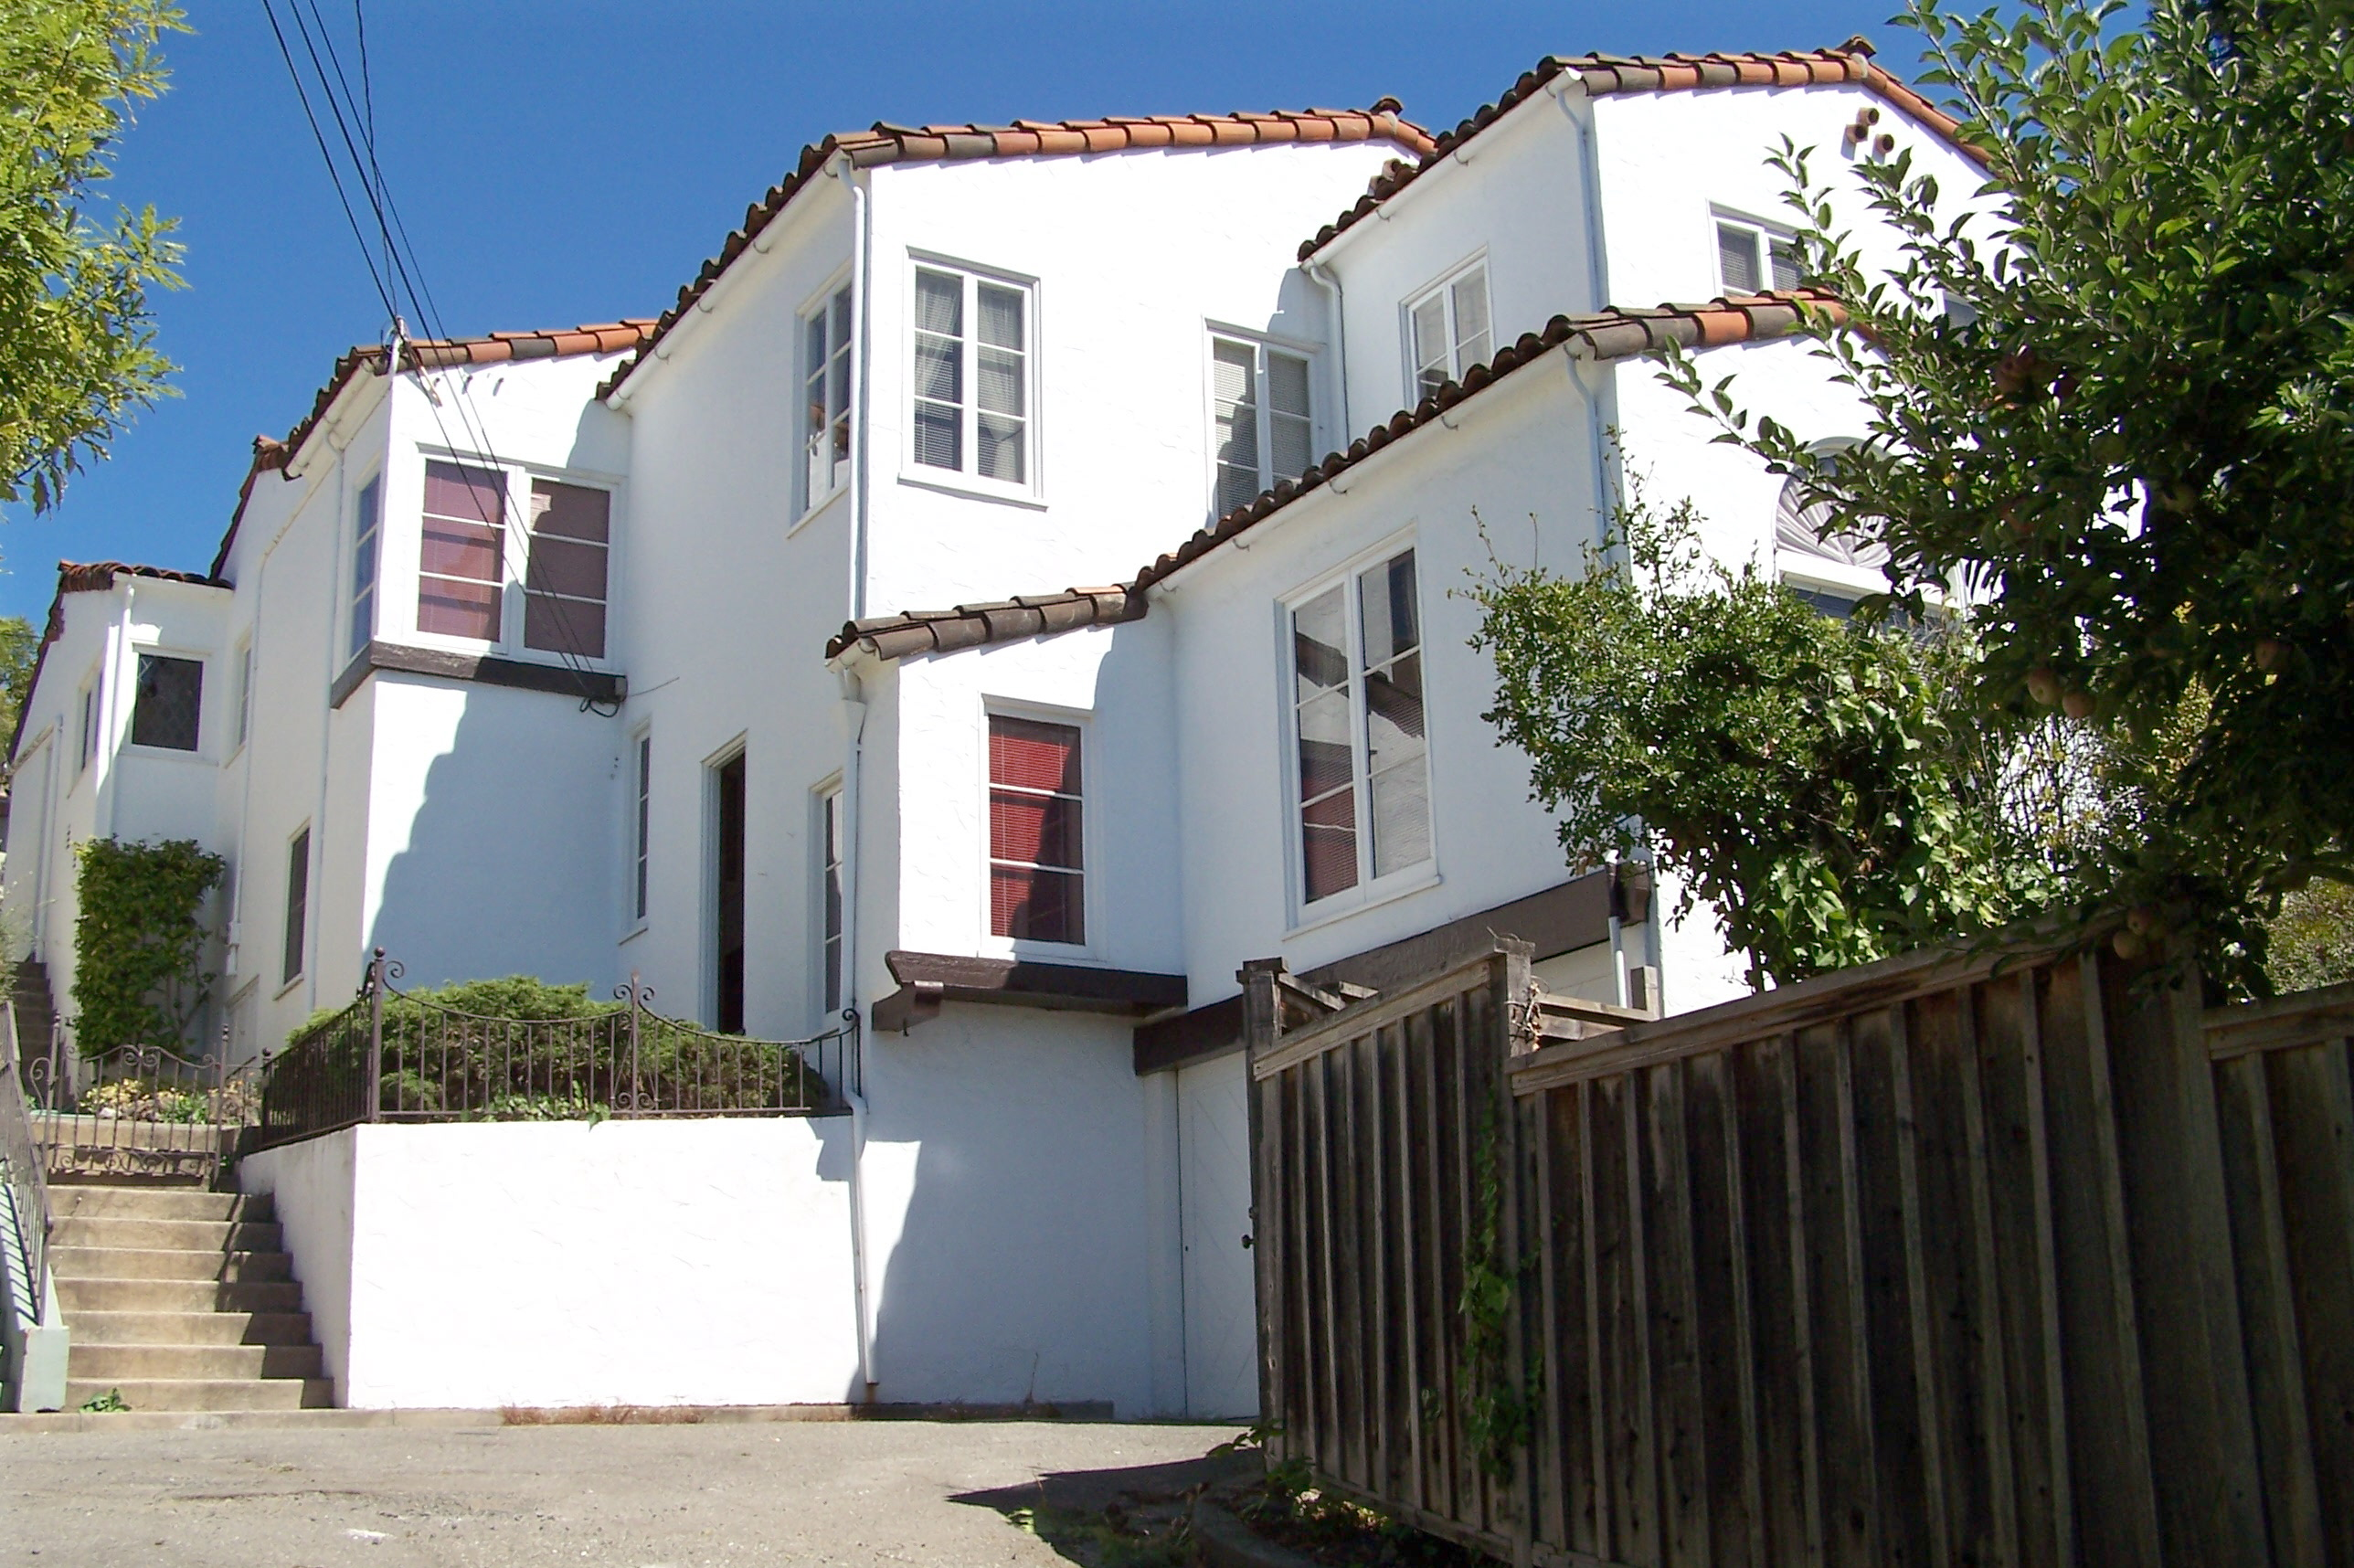 Housing Uc Berkeley Extension